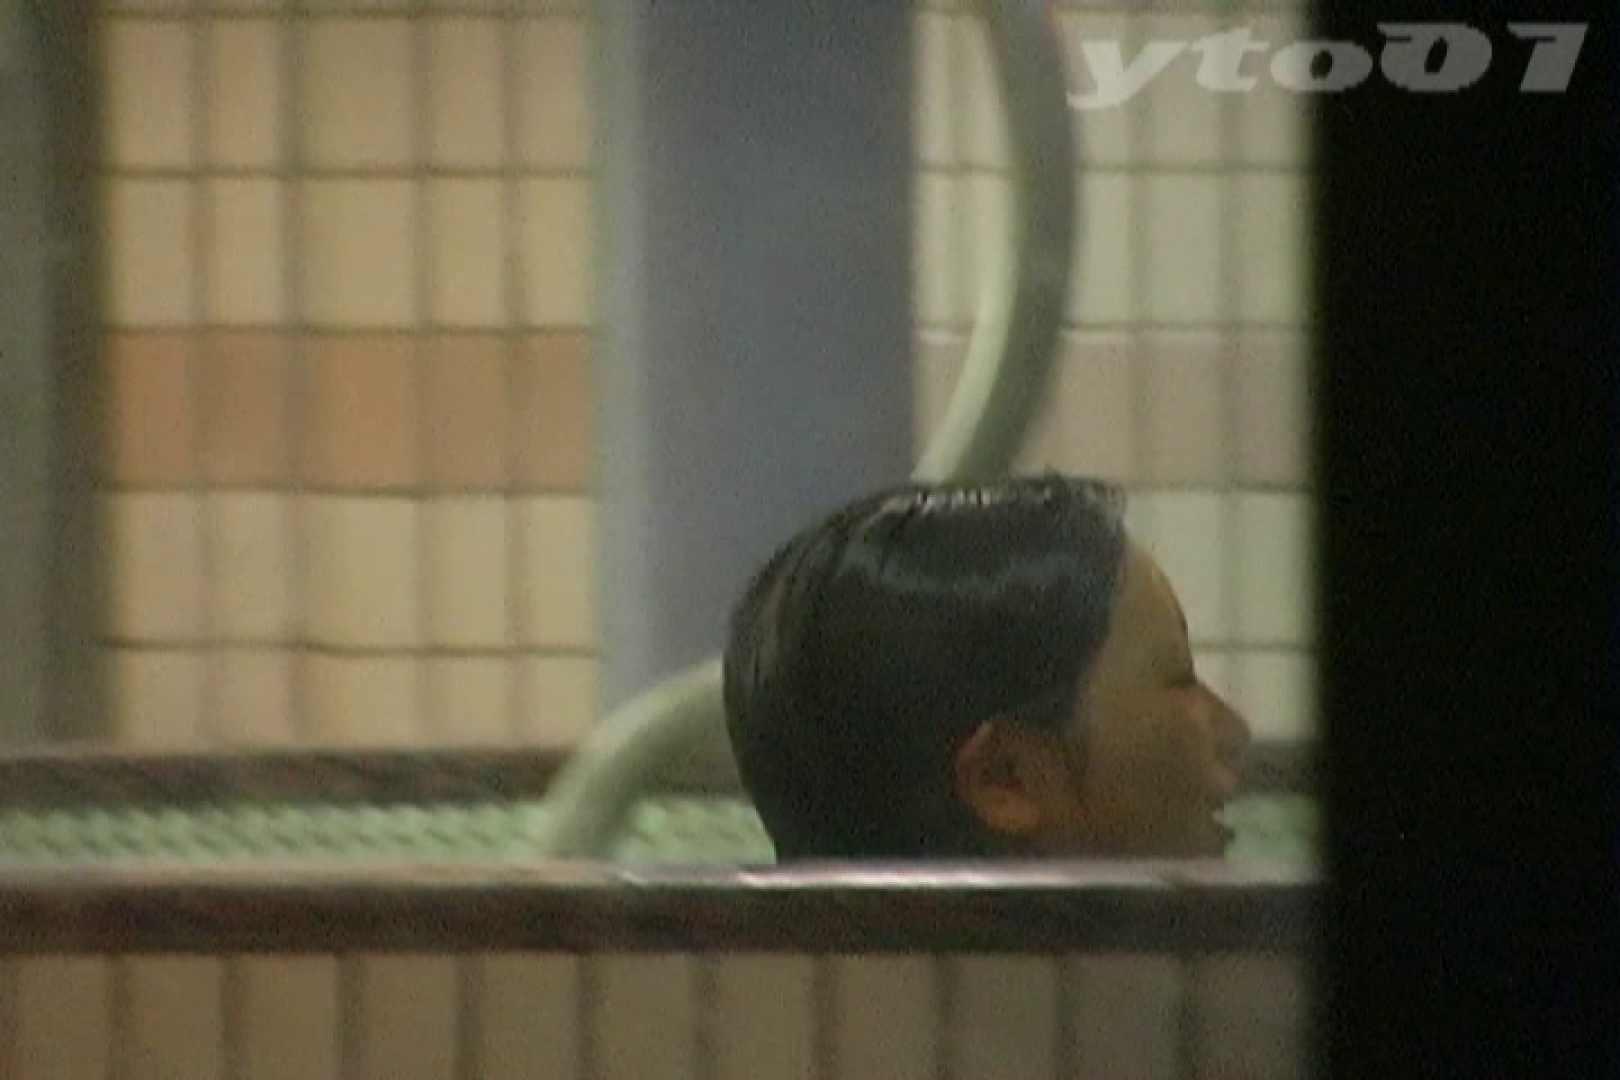 ▲復活限定▲合宿ホテル女風呂盗撮 Vol.07 0 | 0  92画像 16